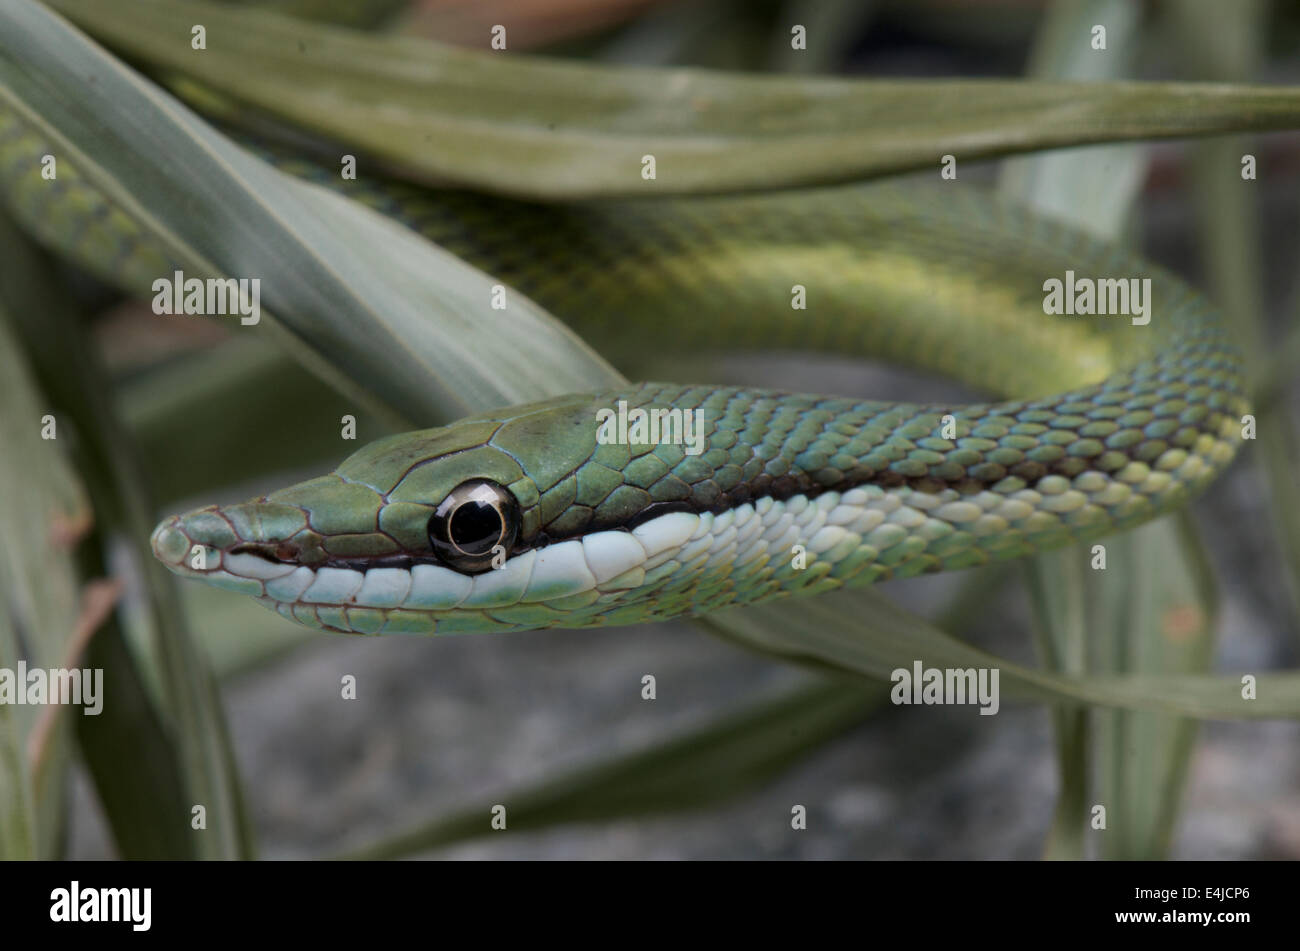 Baron's green racer / Philodryas baroni - Stock Image